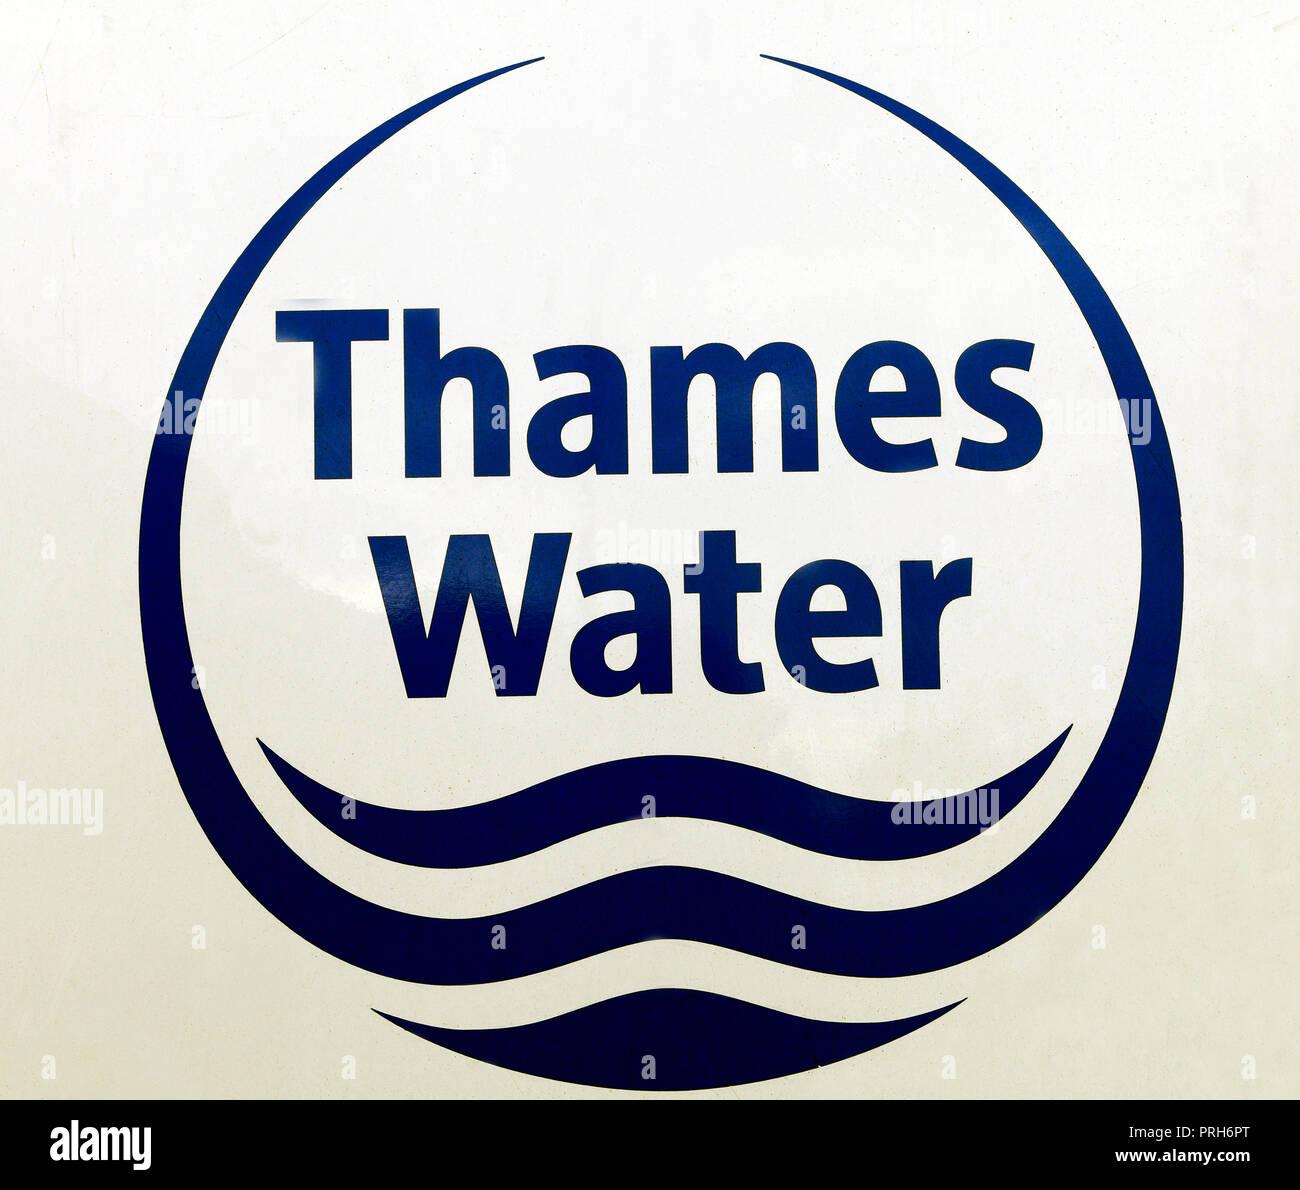 Thames Water, company, water board, logo, England, UK - Stock Image